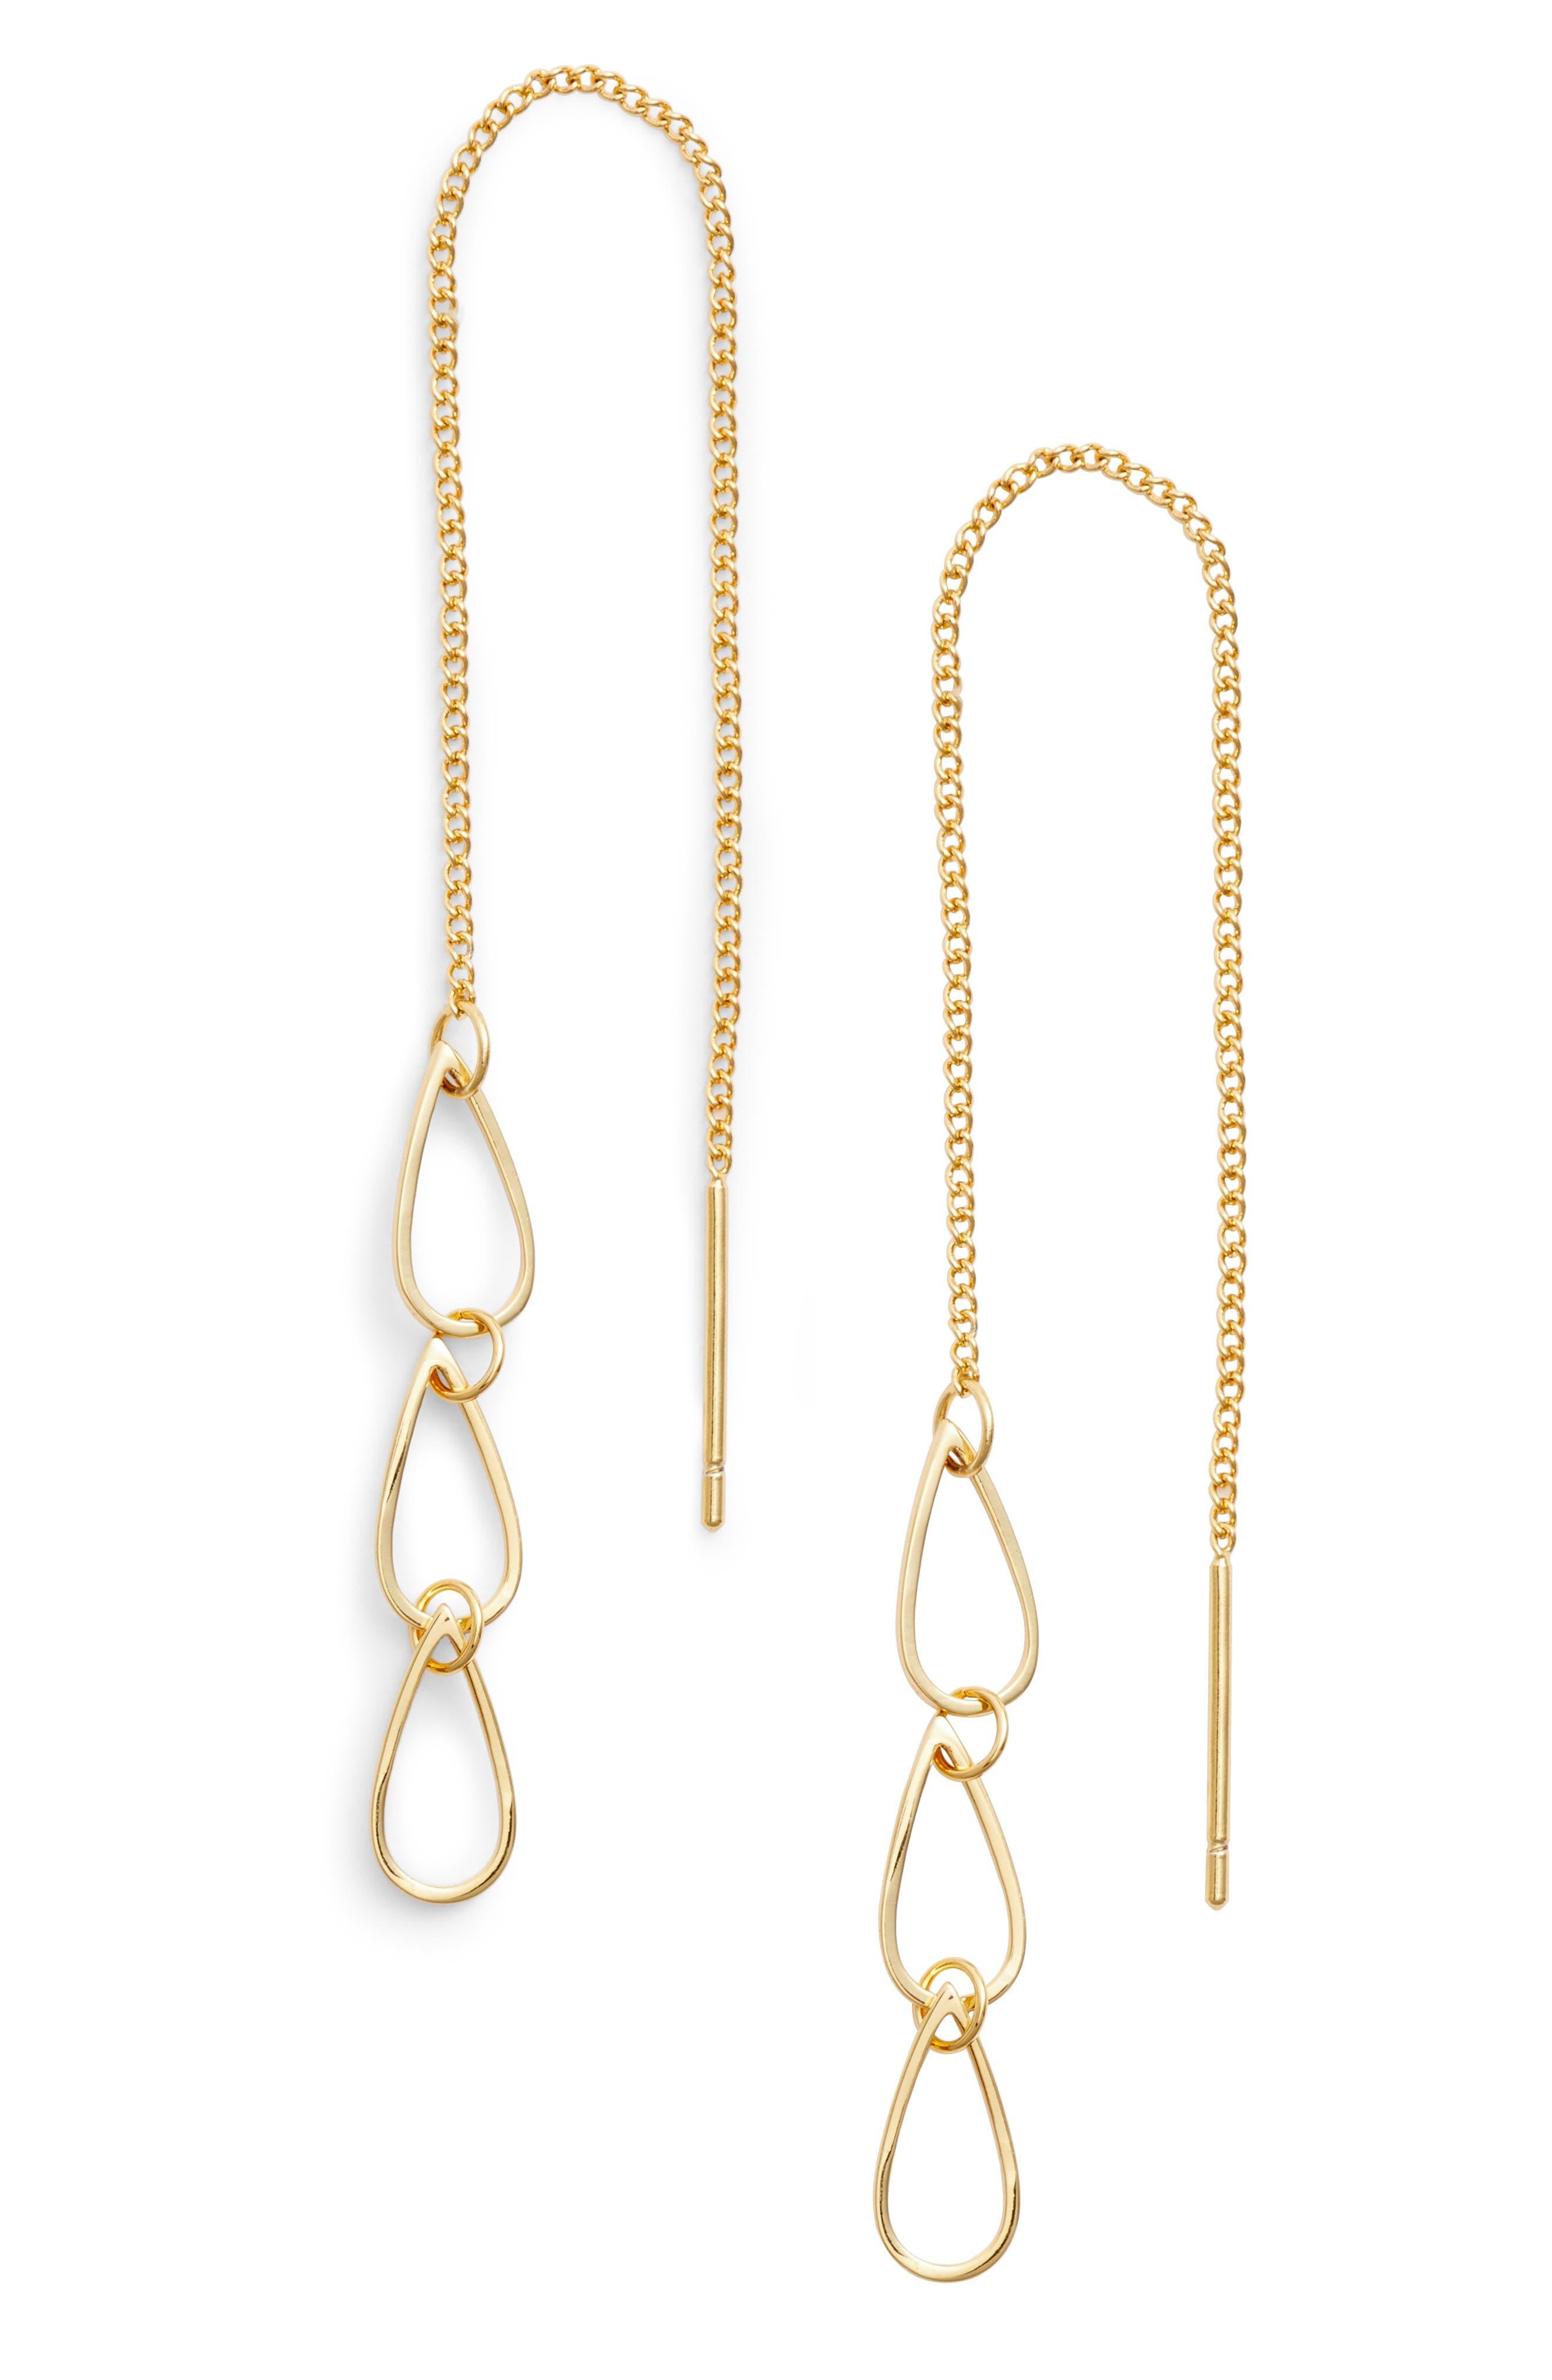 Leiko Threader Earrings,                             Main thumbnail 1, color,                             710